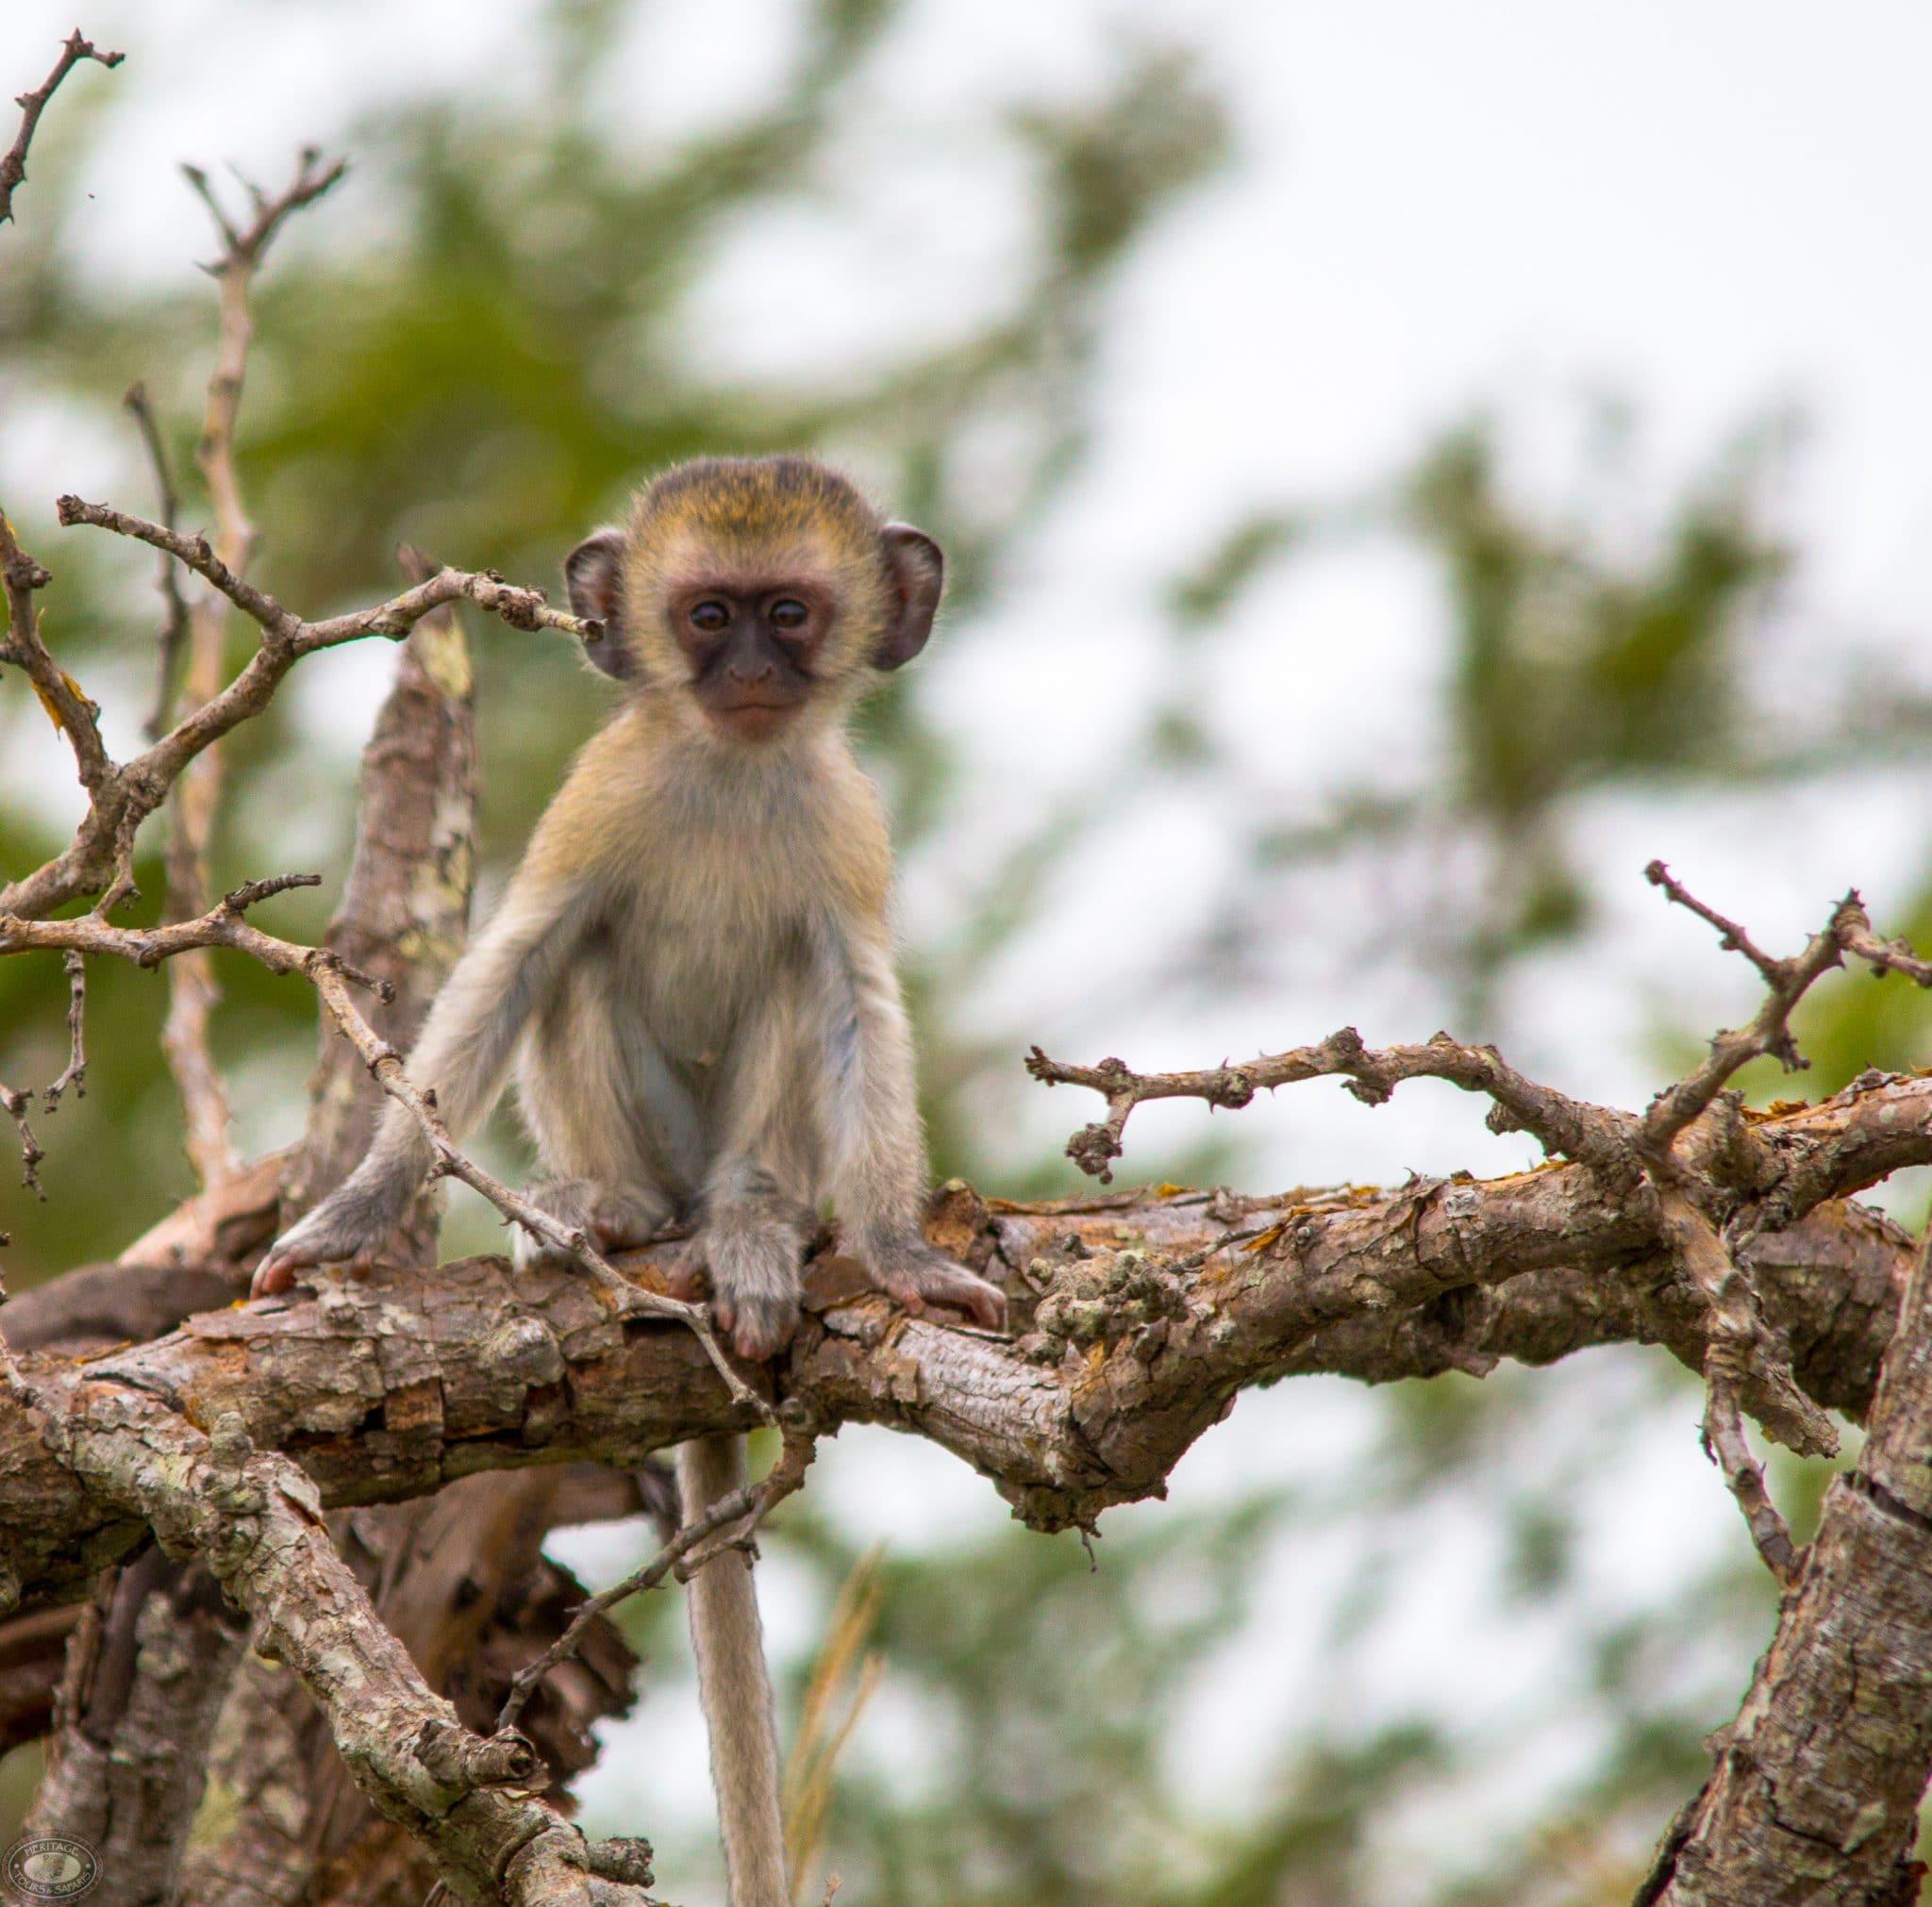 Baby vervet monkey on perch